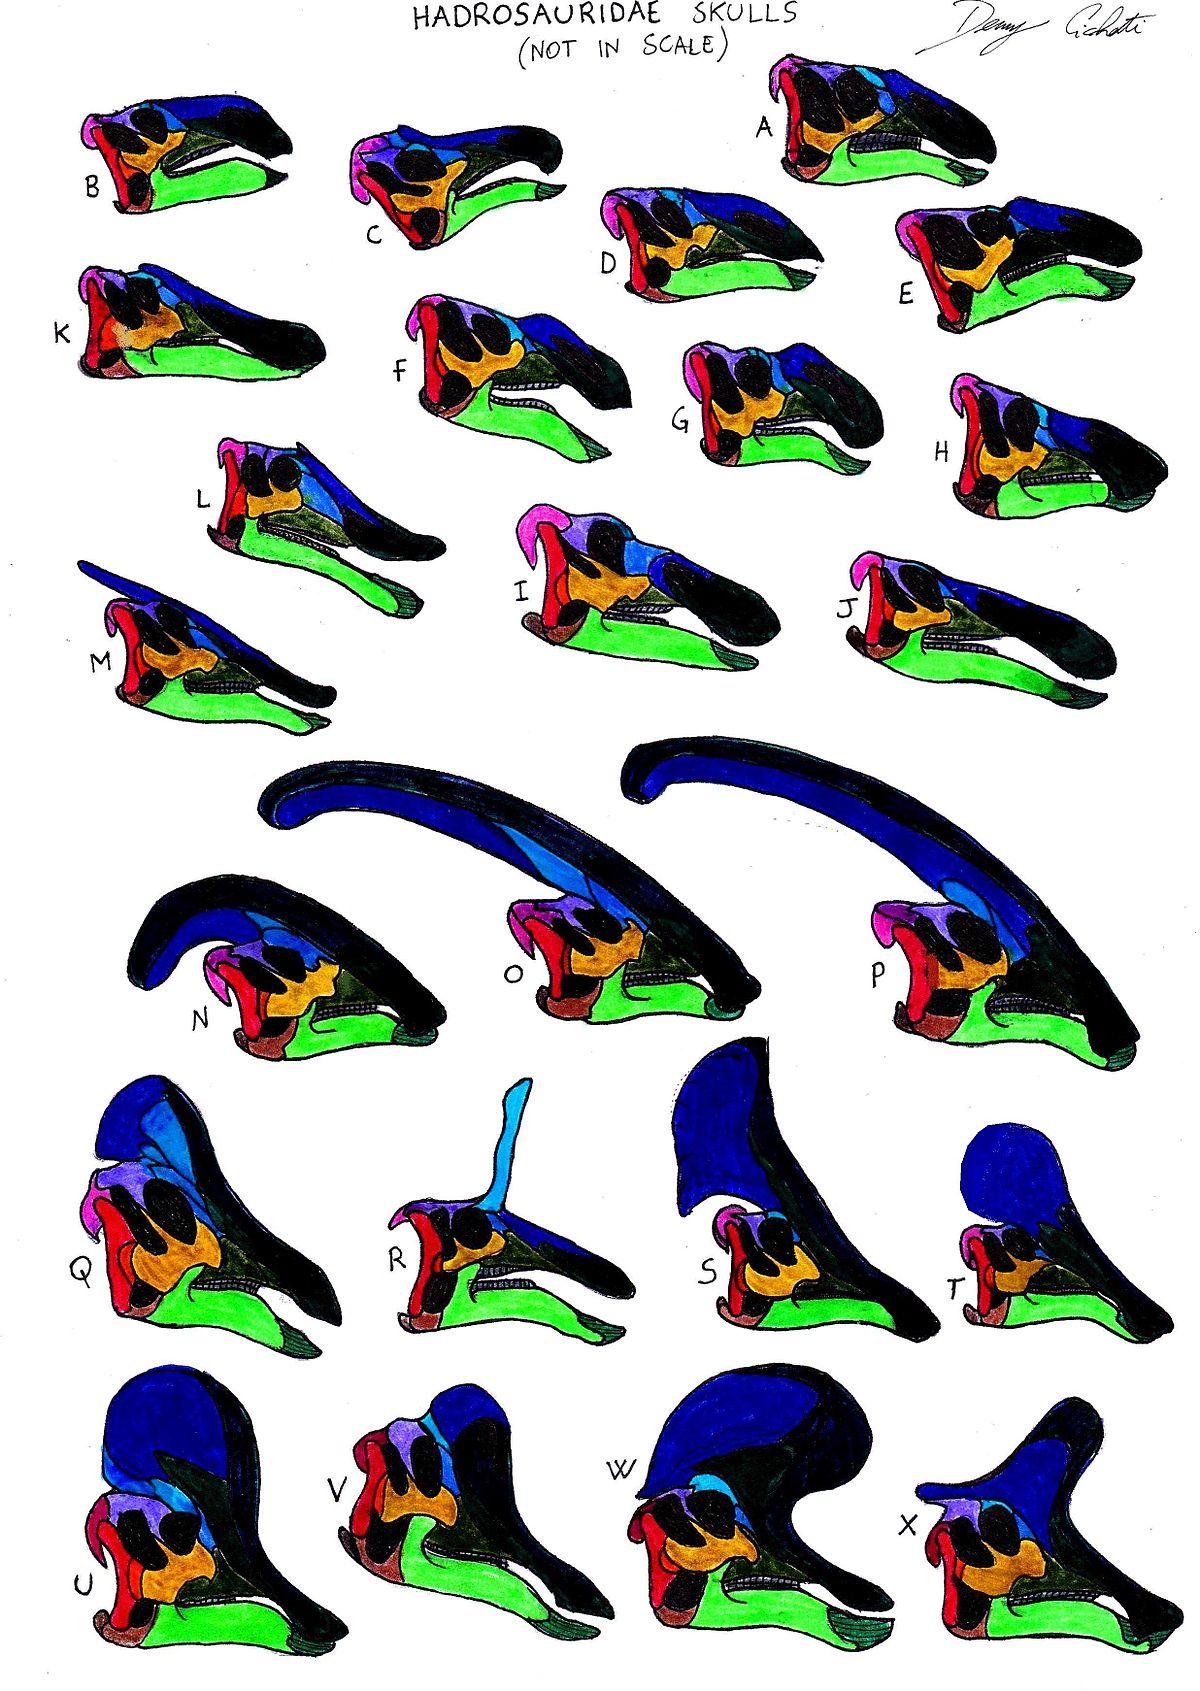 Hadrosauridae skull comparison (not in scale).jpg